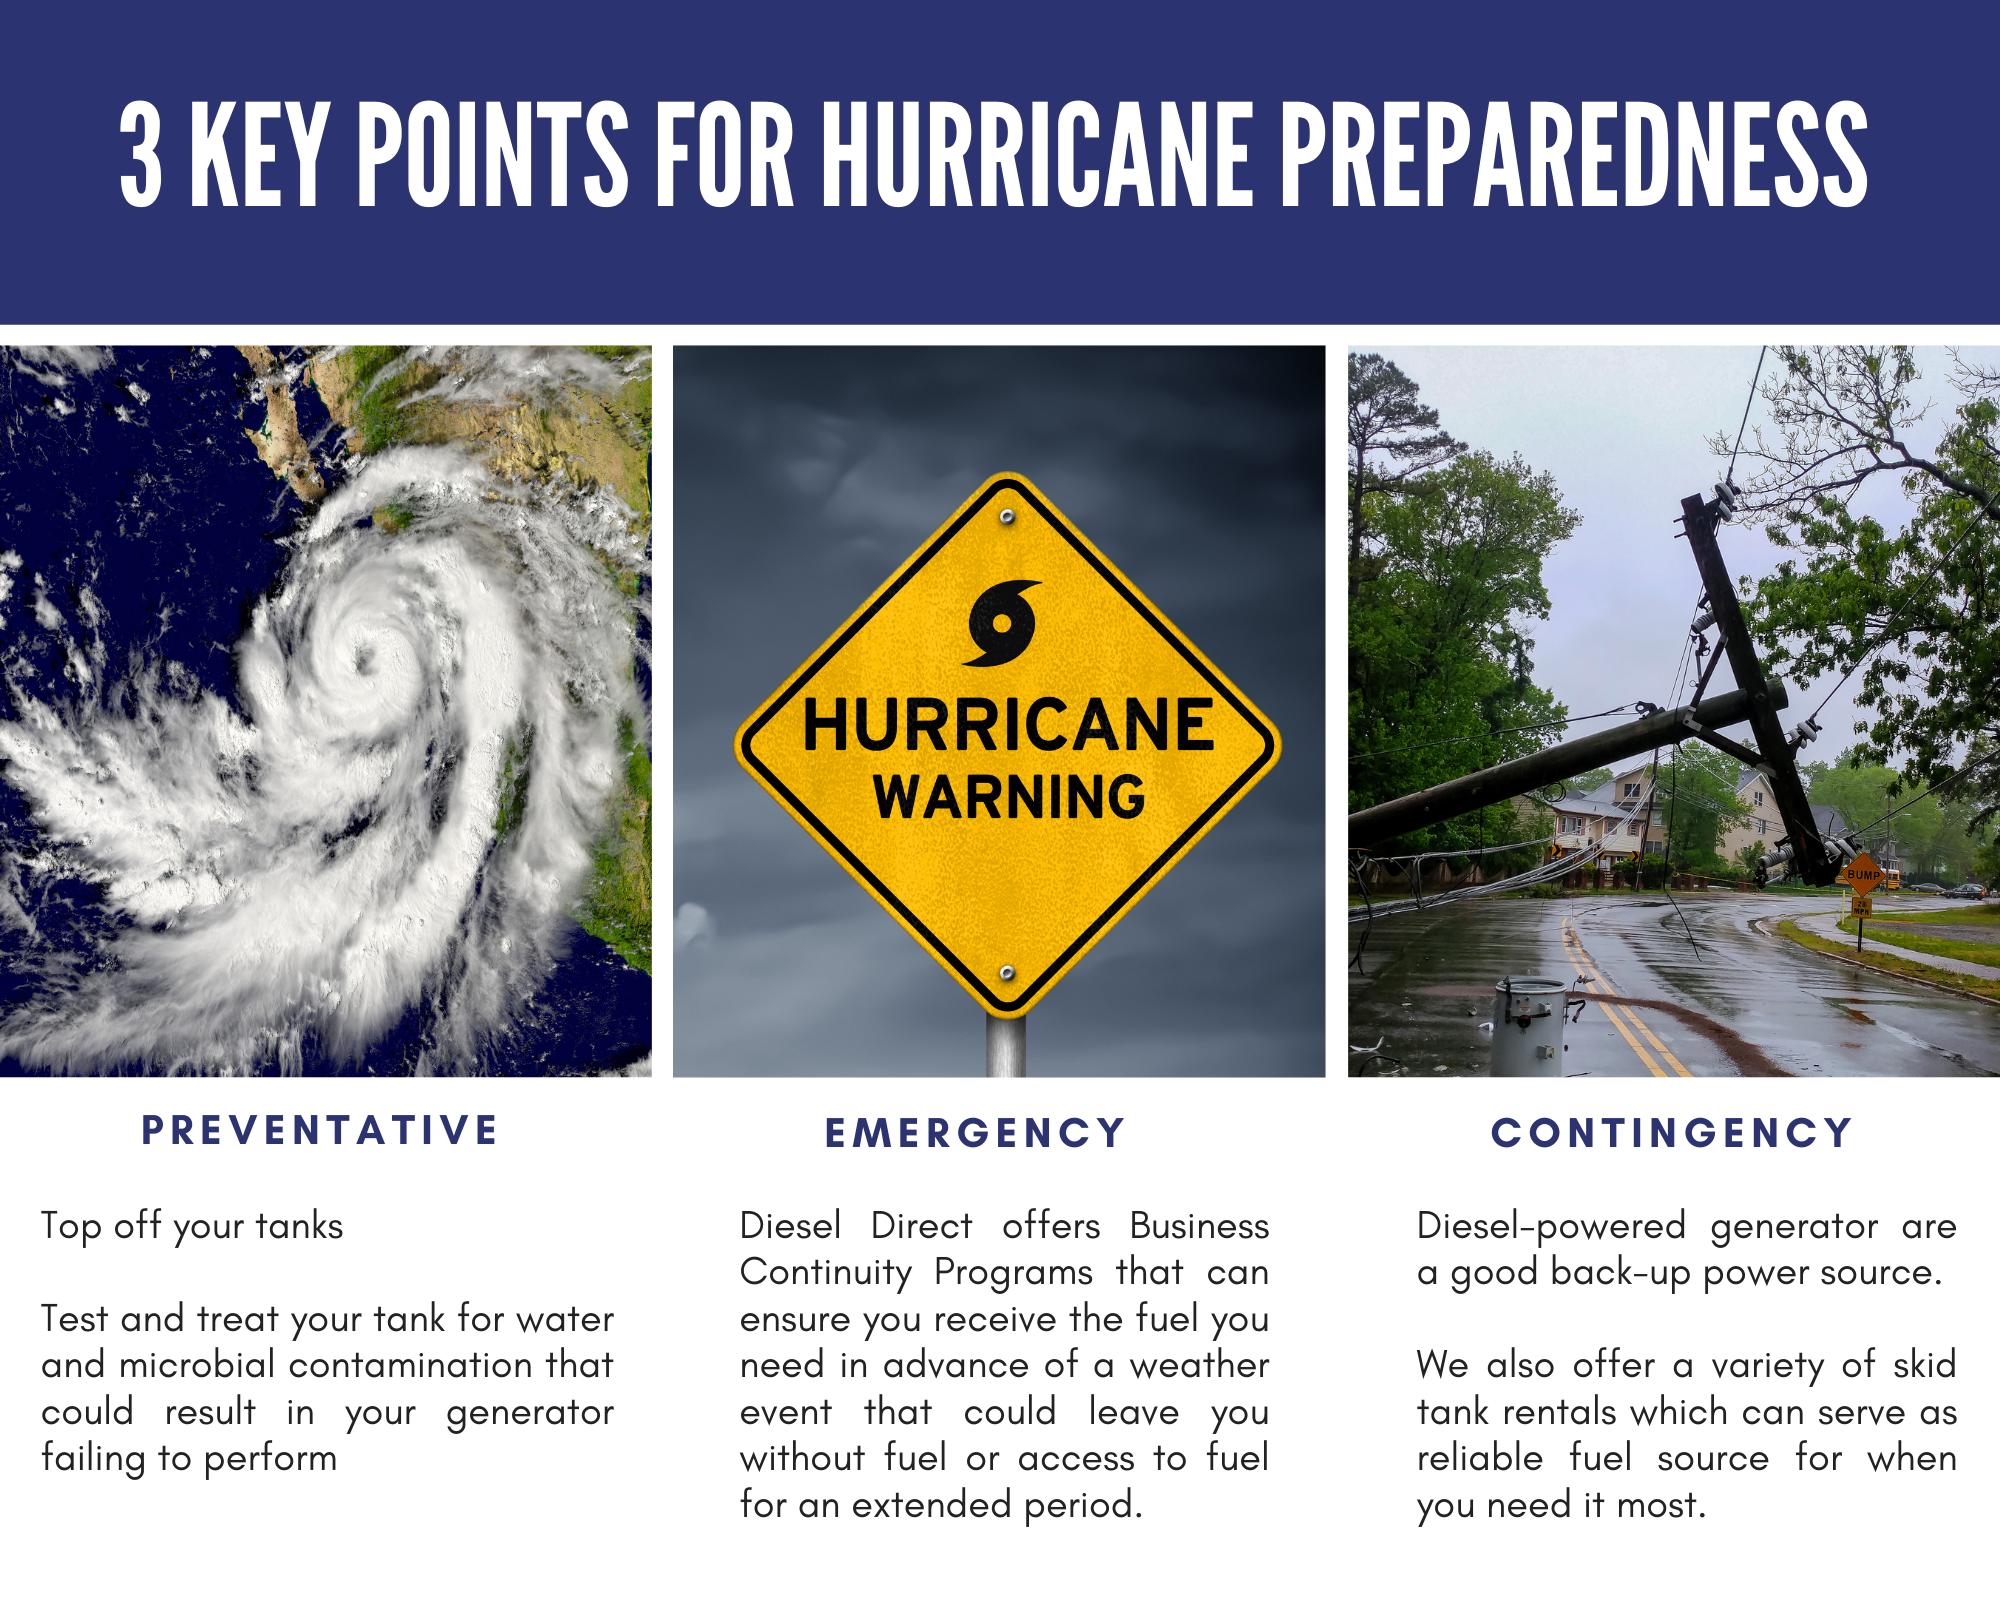 3 Key points for hurricane preparedness